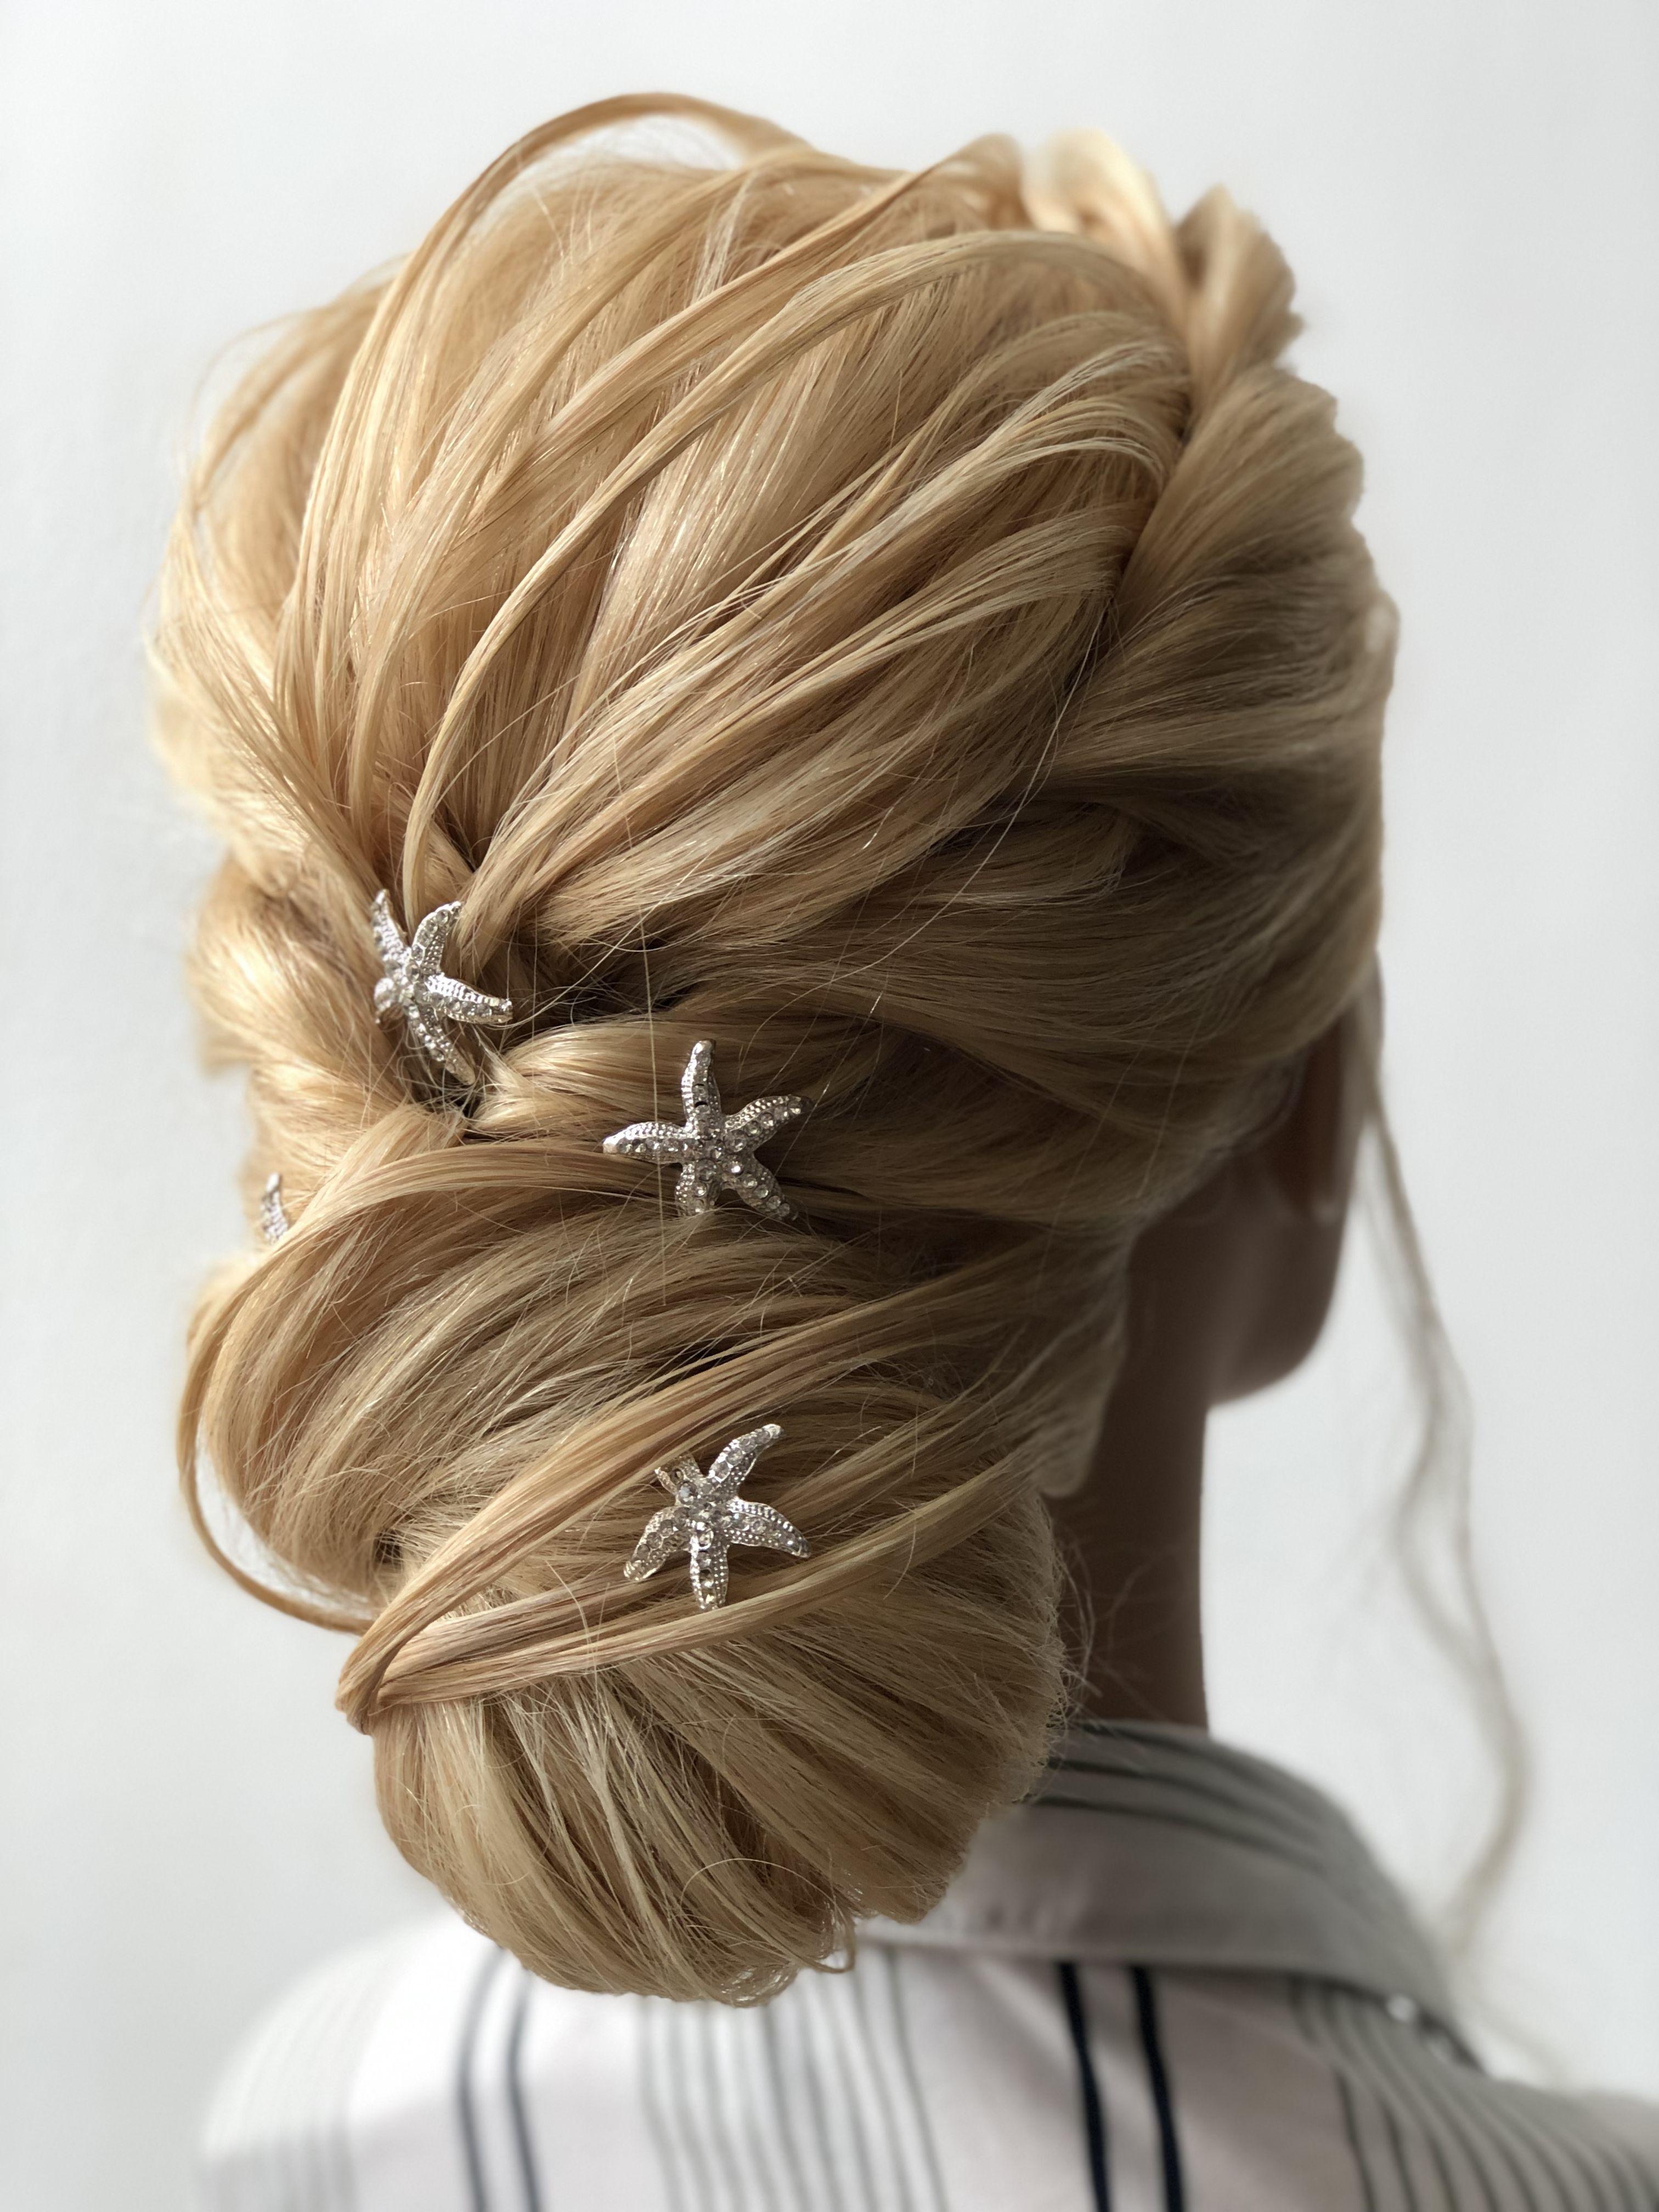 Braut Frisur Modern Frisuren Frisur Hochgesteckt Hochsteckfrisur